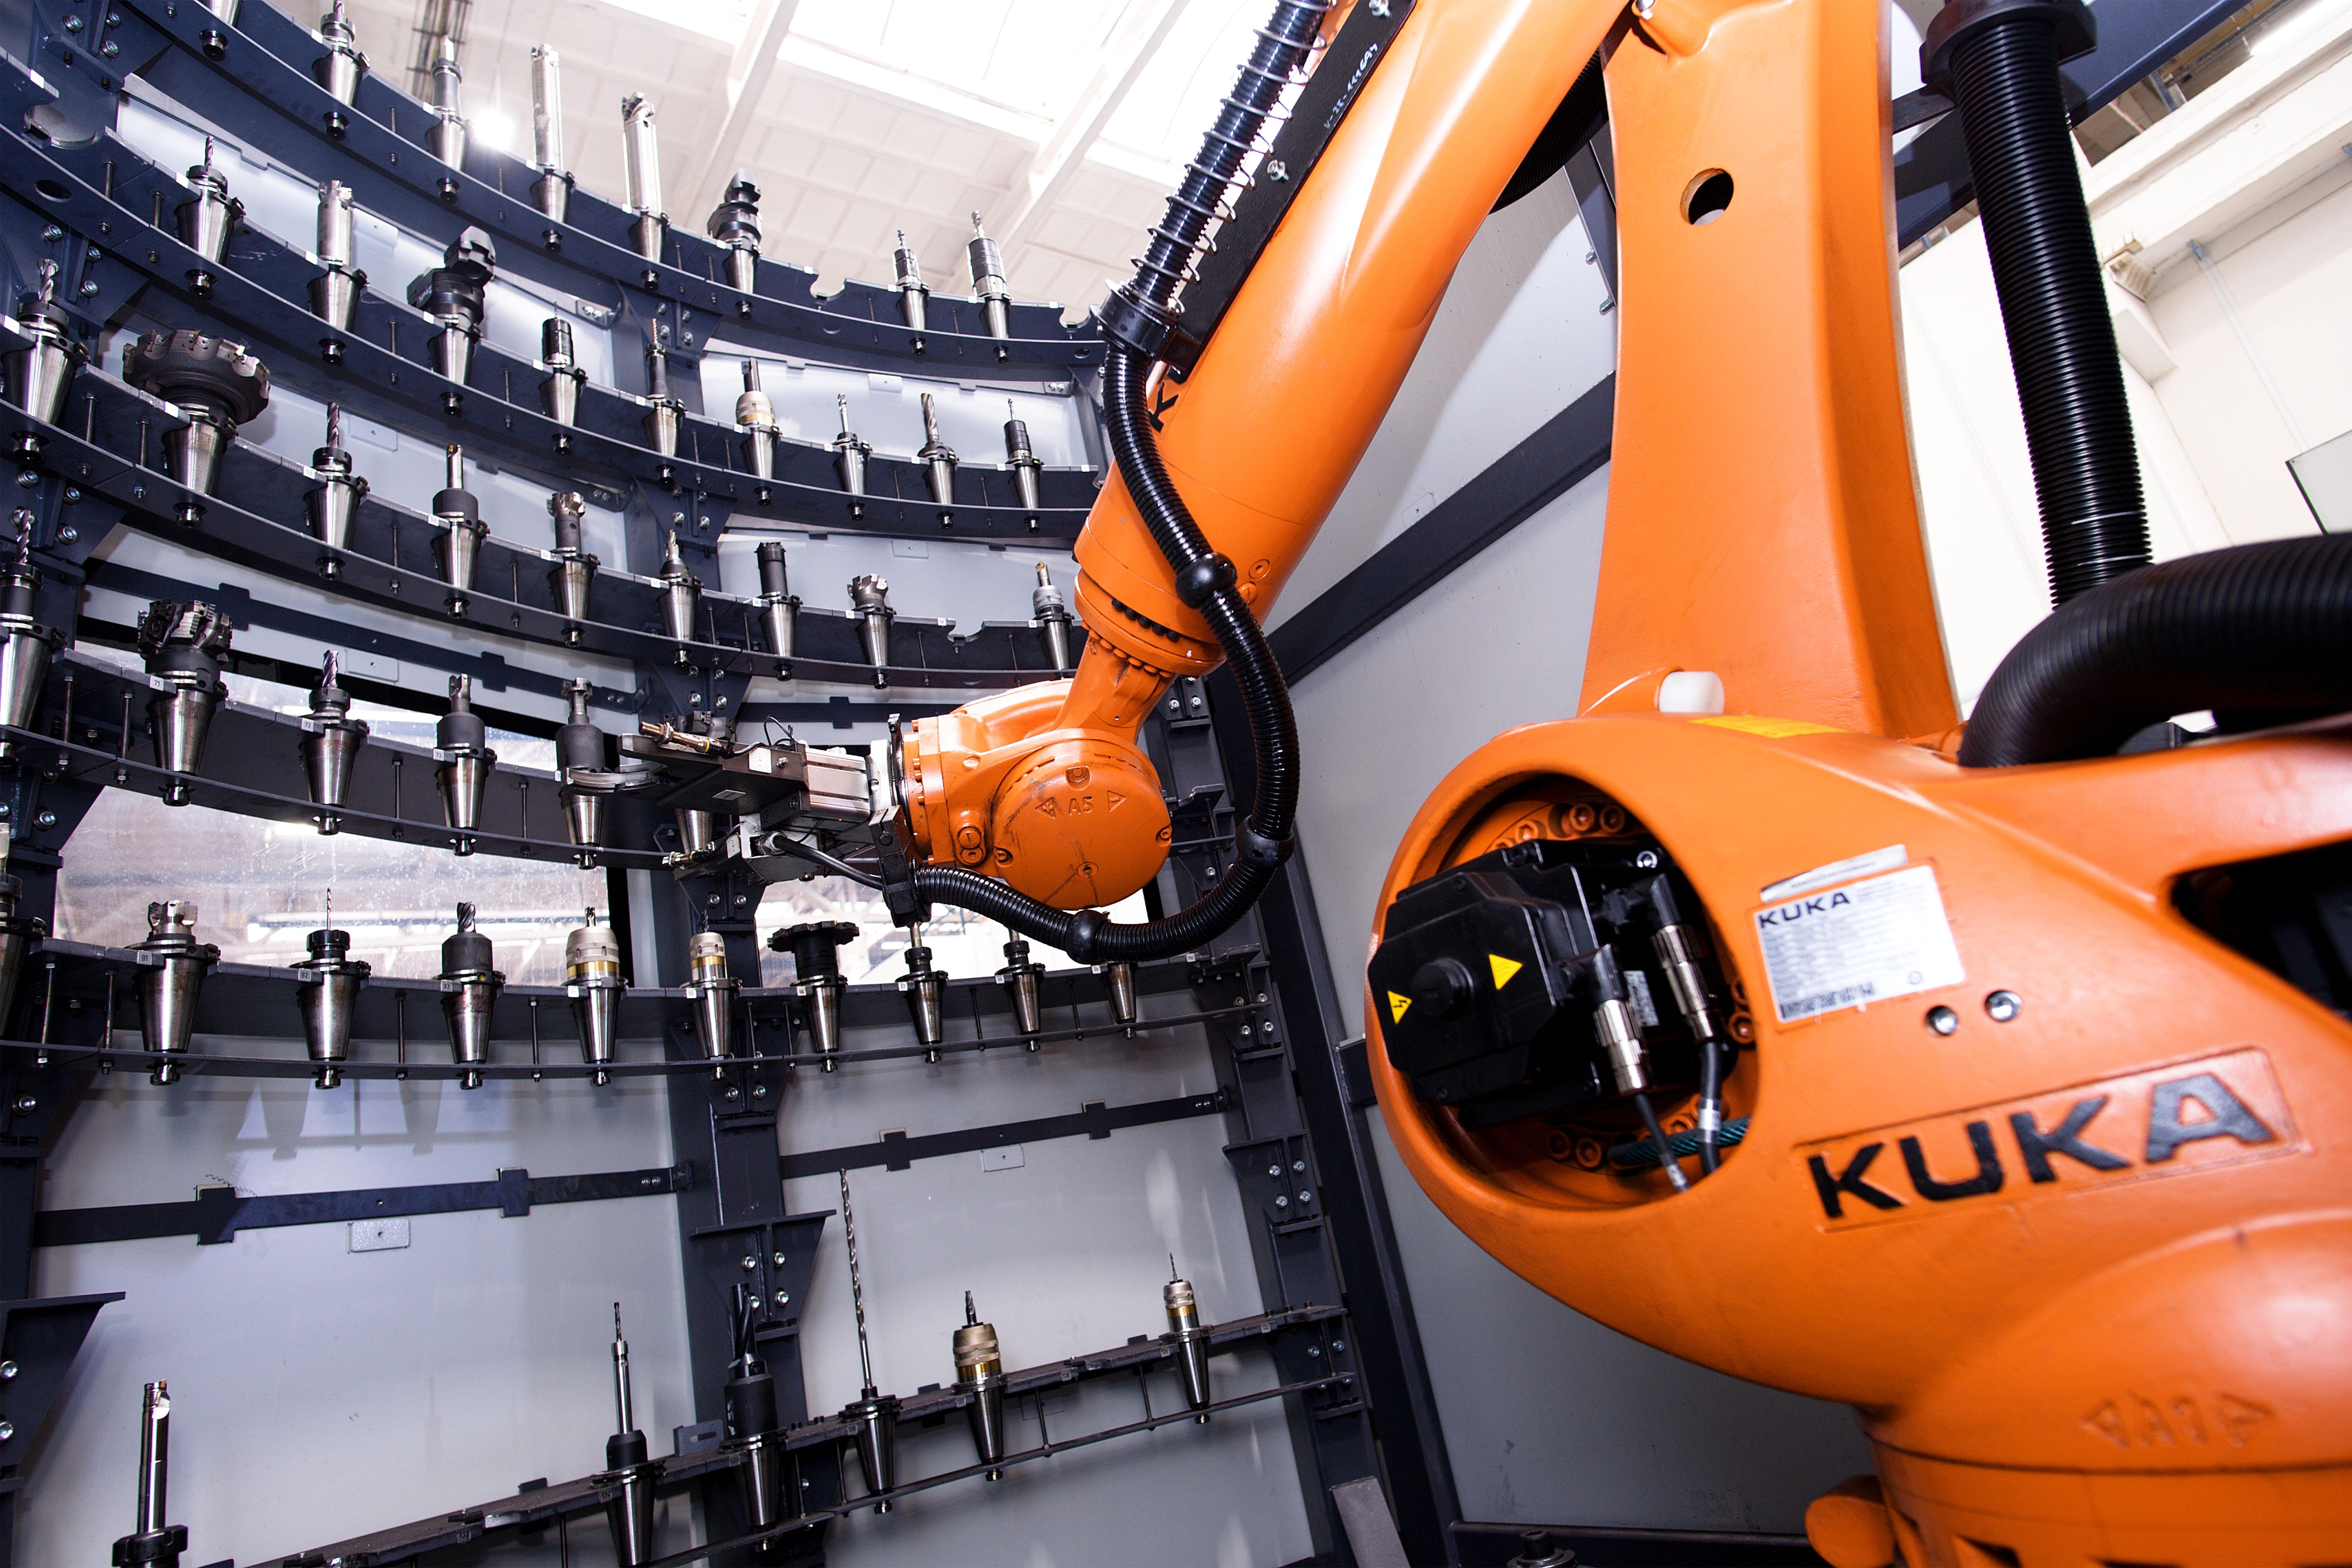 Werkzeugarena mit KUKA Roboter 96/125/189 - Image3